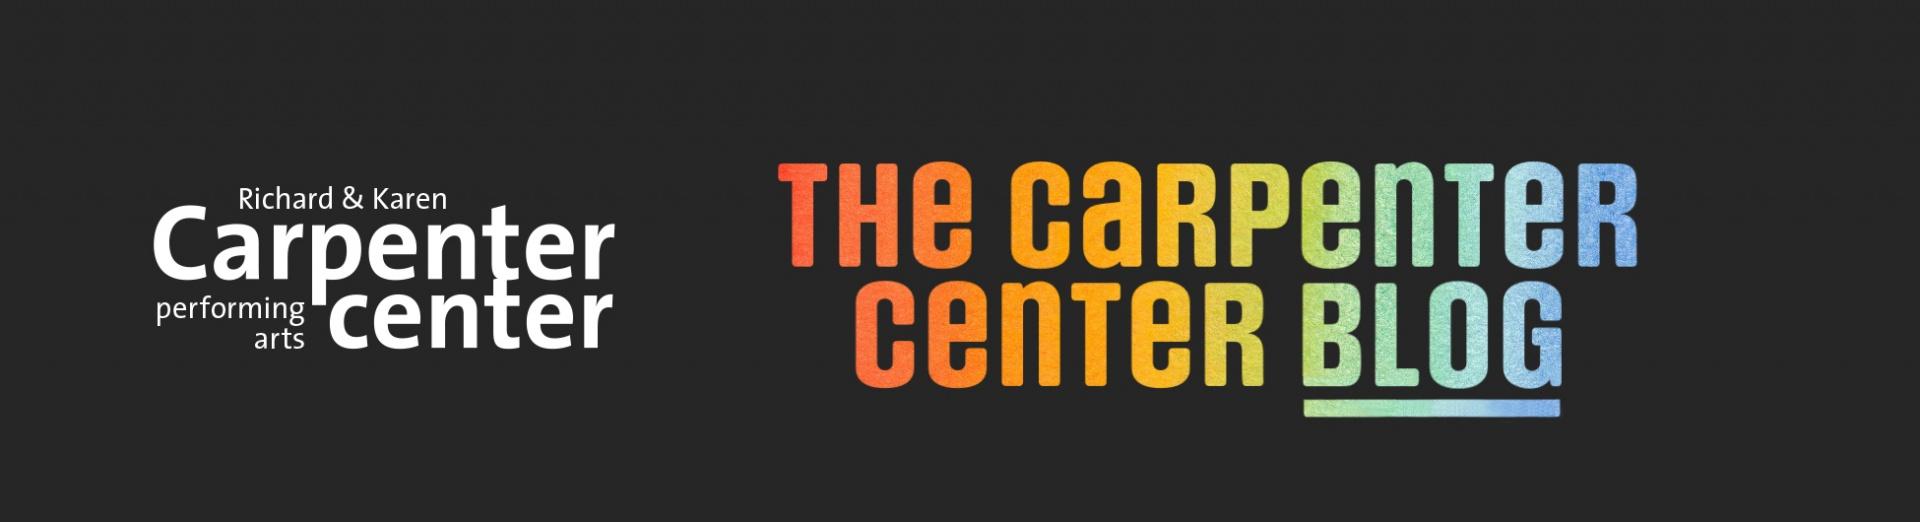 The Carpenter Center Blog